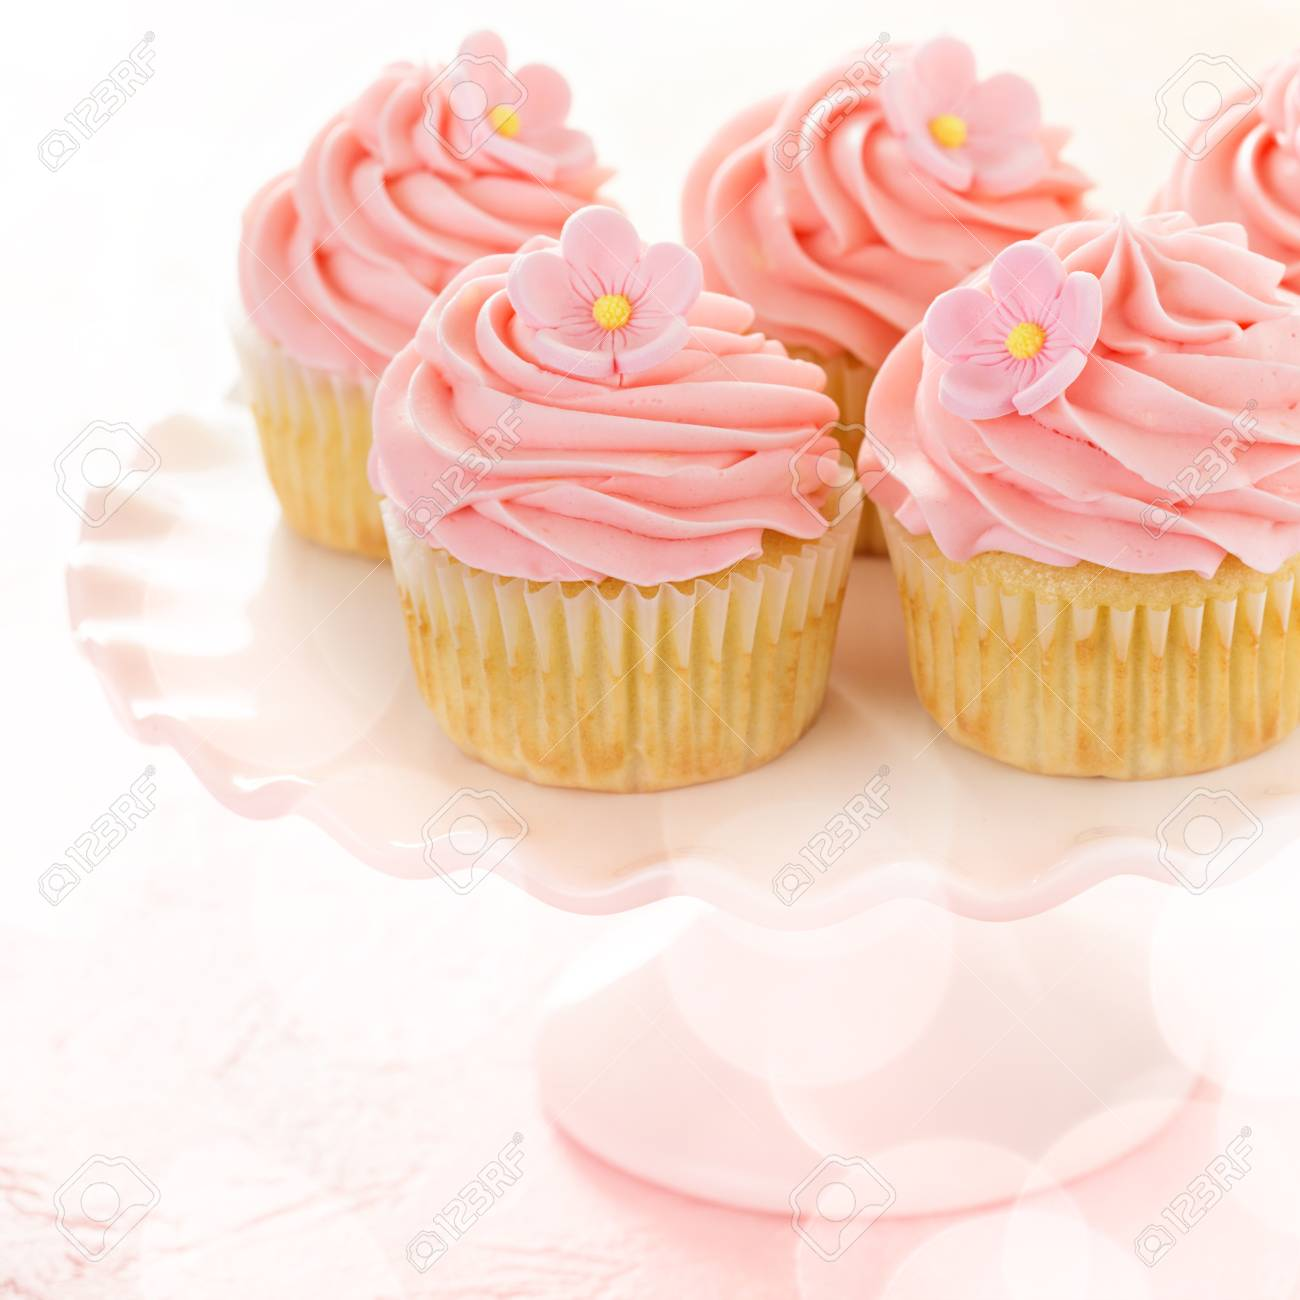 Vanille Cupcakes Mit Rosa Himbeer Zuckerguss Fur Ein Madchen